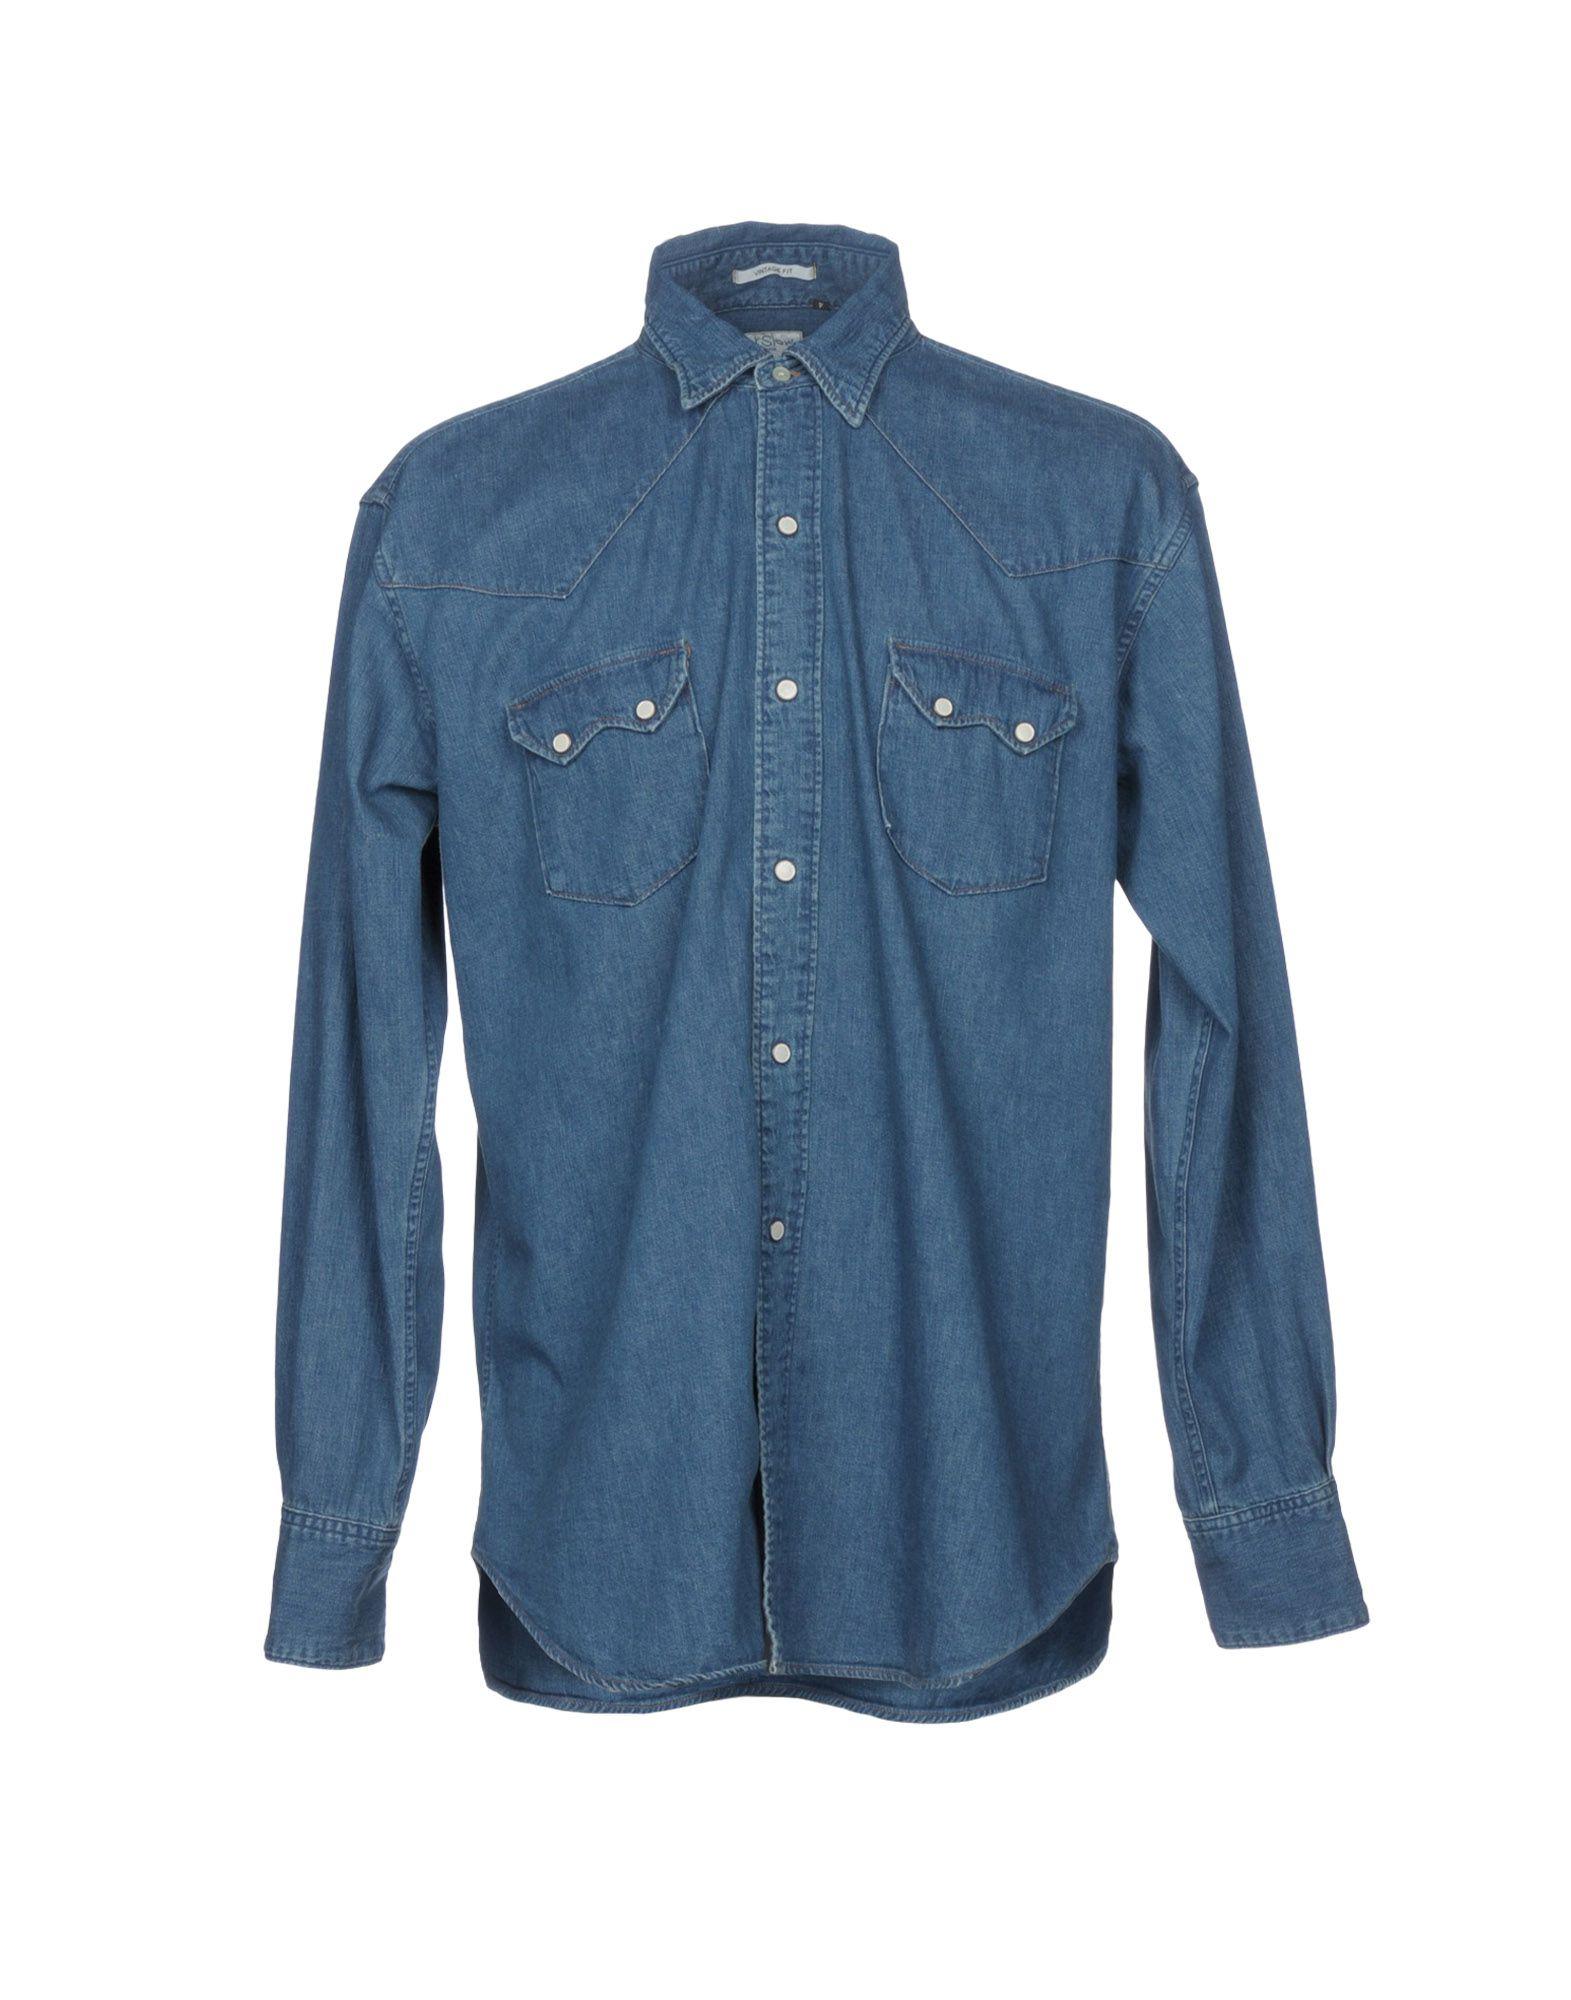 ORSLOW Denim Shirt in Blue